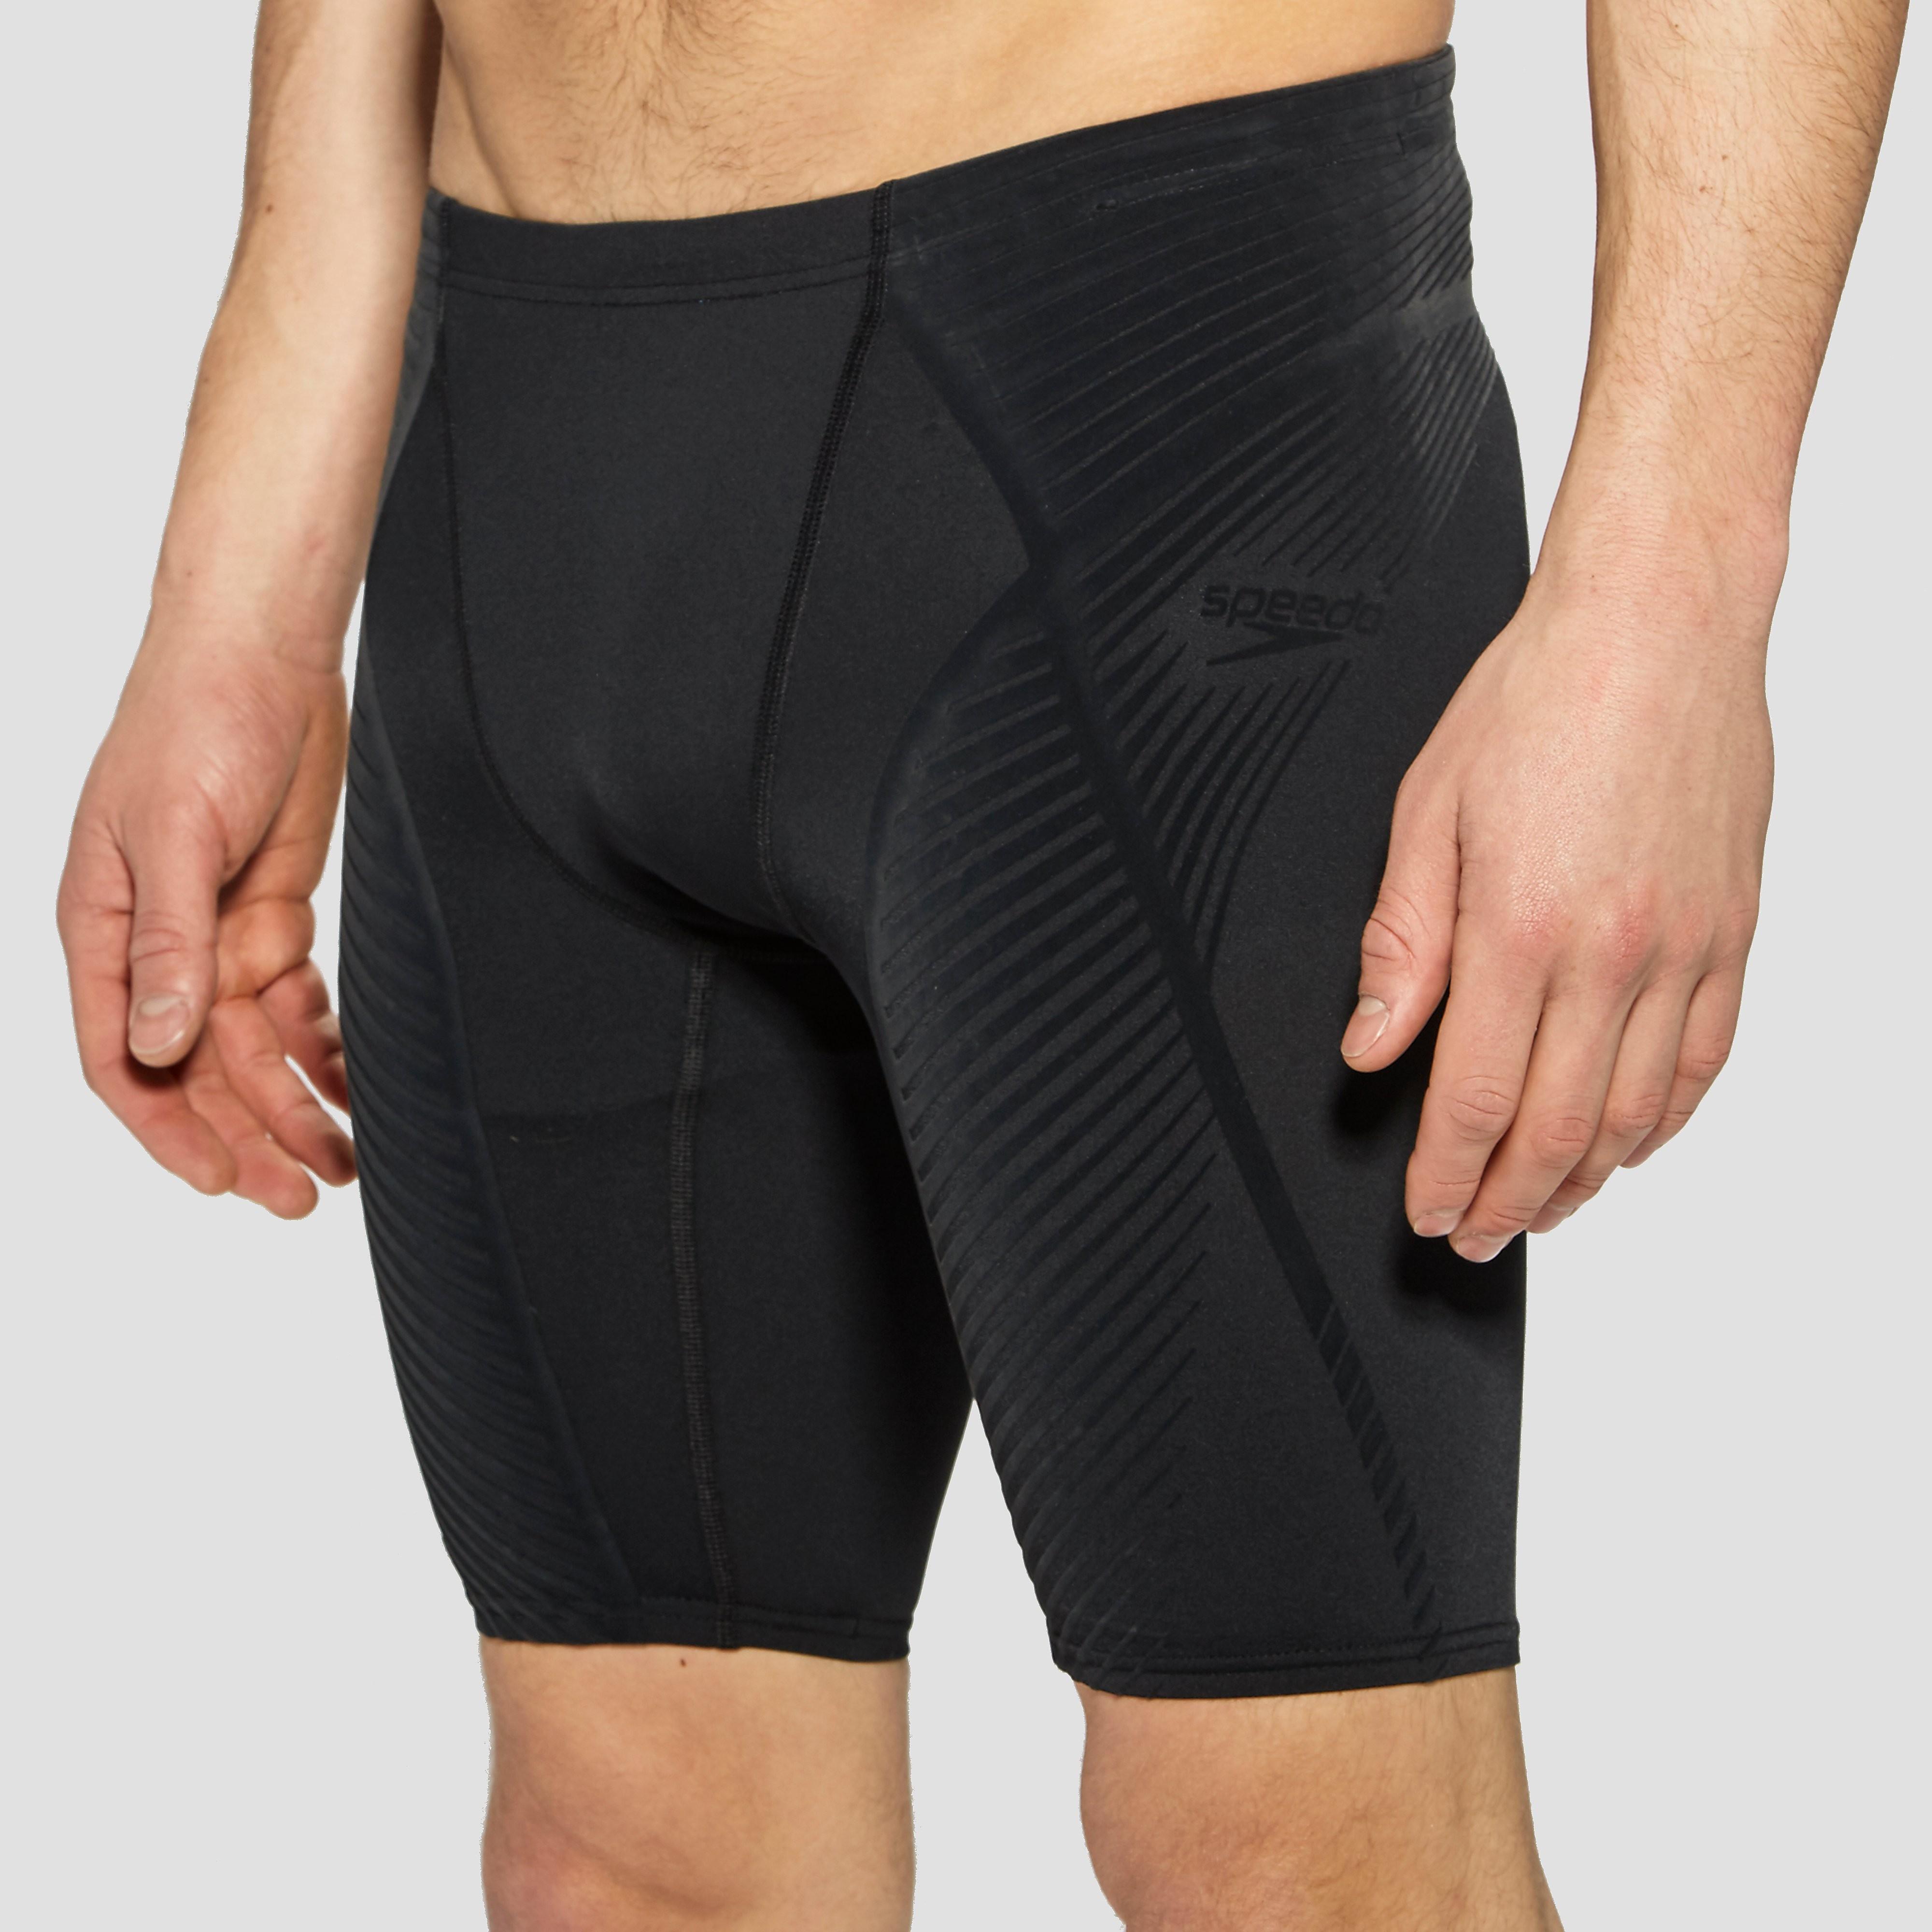 Speedo Fit Power Form Men's Jammer Shorts